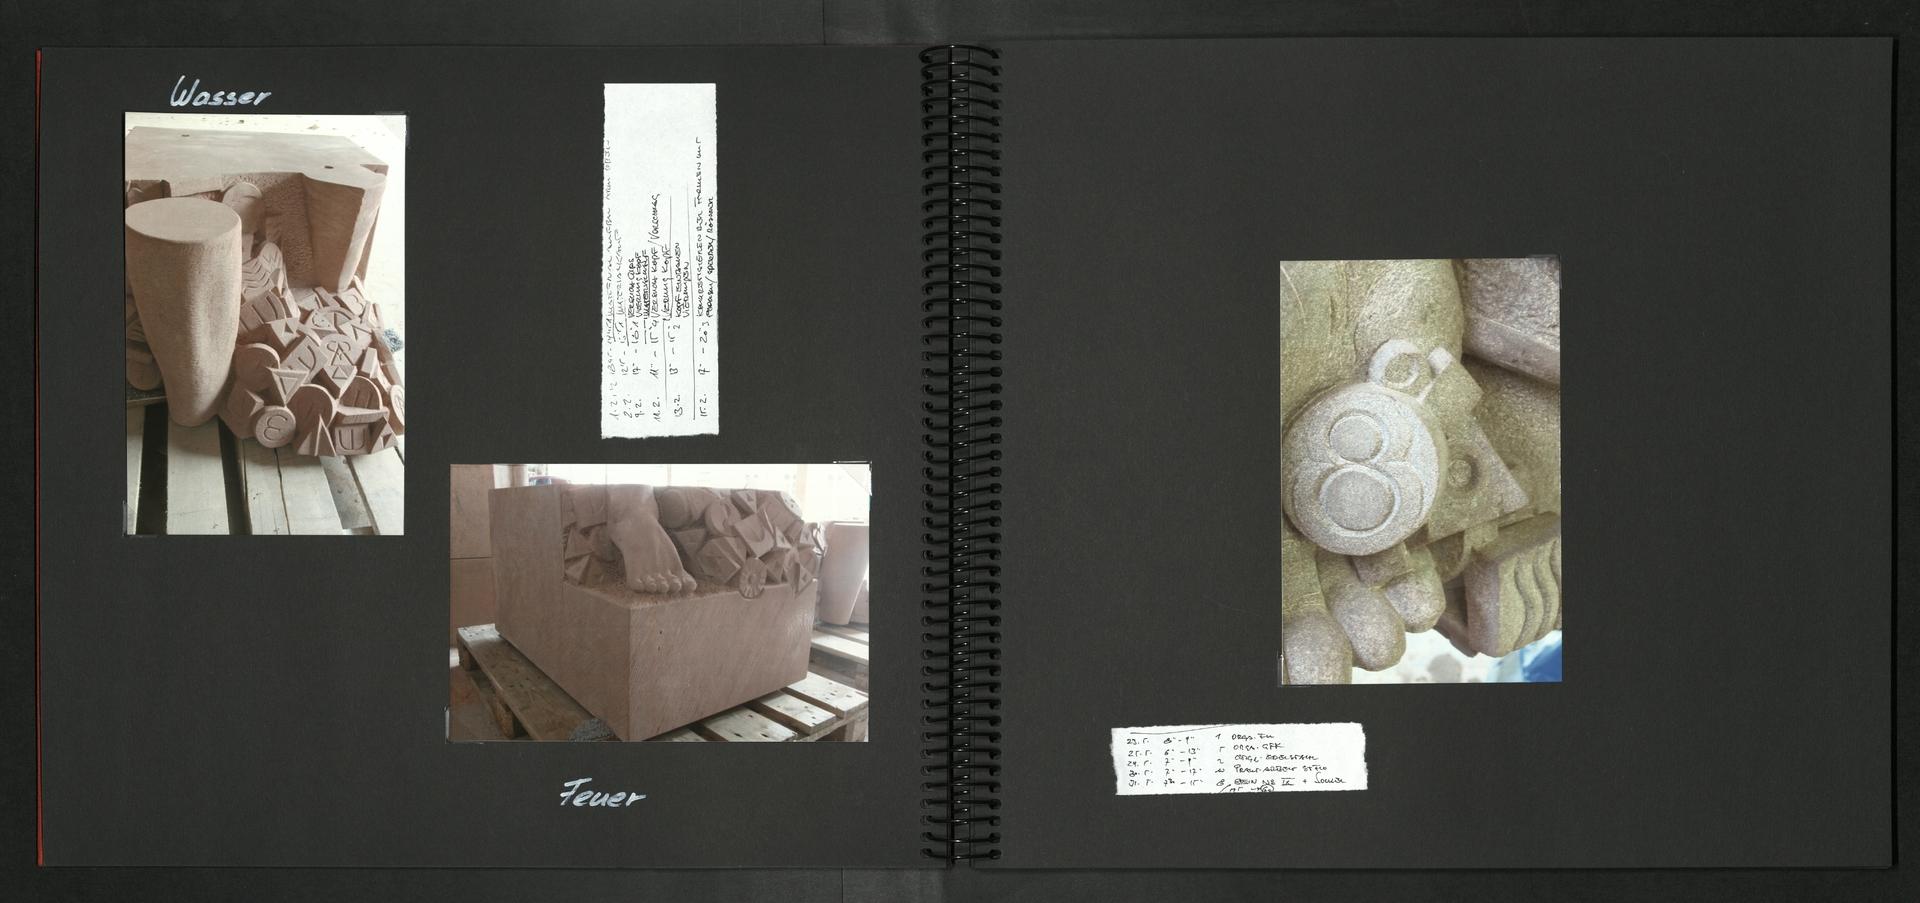 ssaa-ffw-277-30.jpg